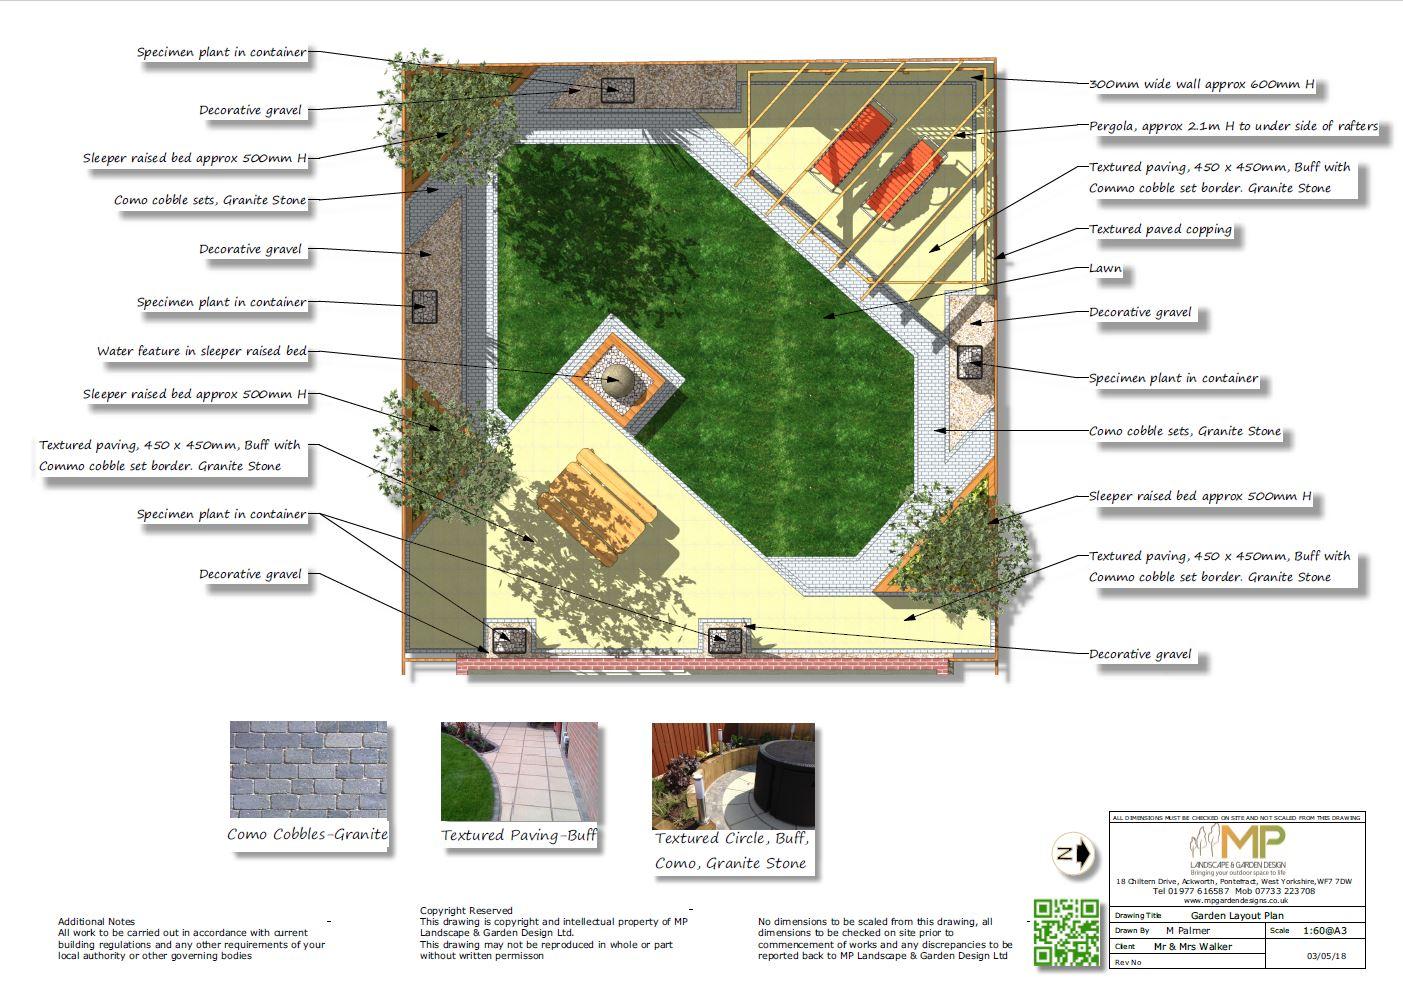 Garden Layout Plans for a rear garden in Notton